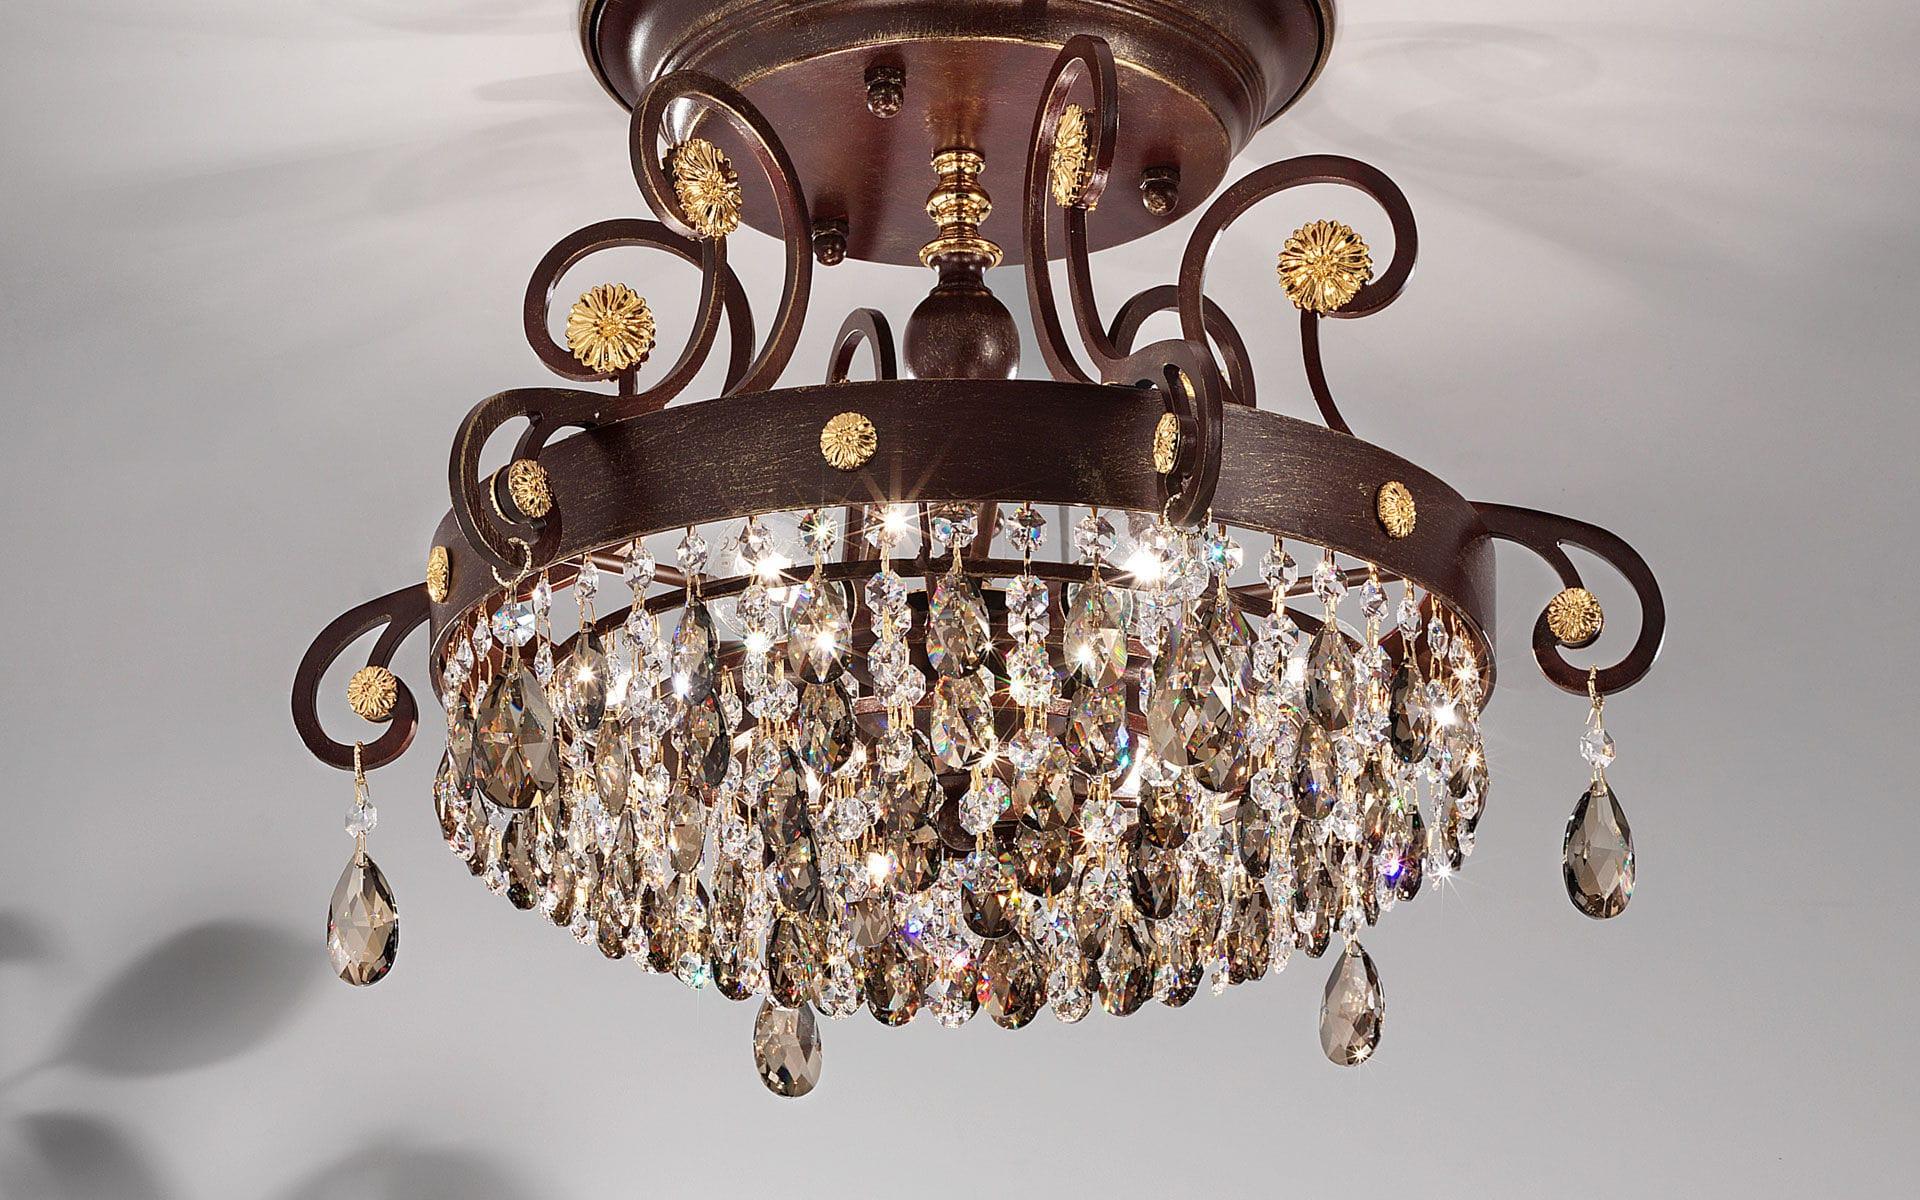 ... classic ceiling light / round / brass / iron & Classic ceiling light / round / brass / iron - ALLURE PL8 - Masiero